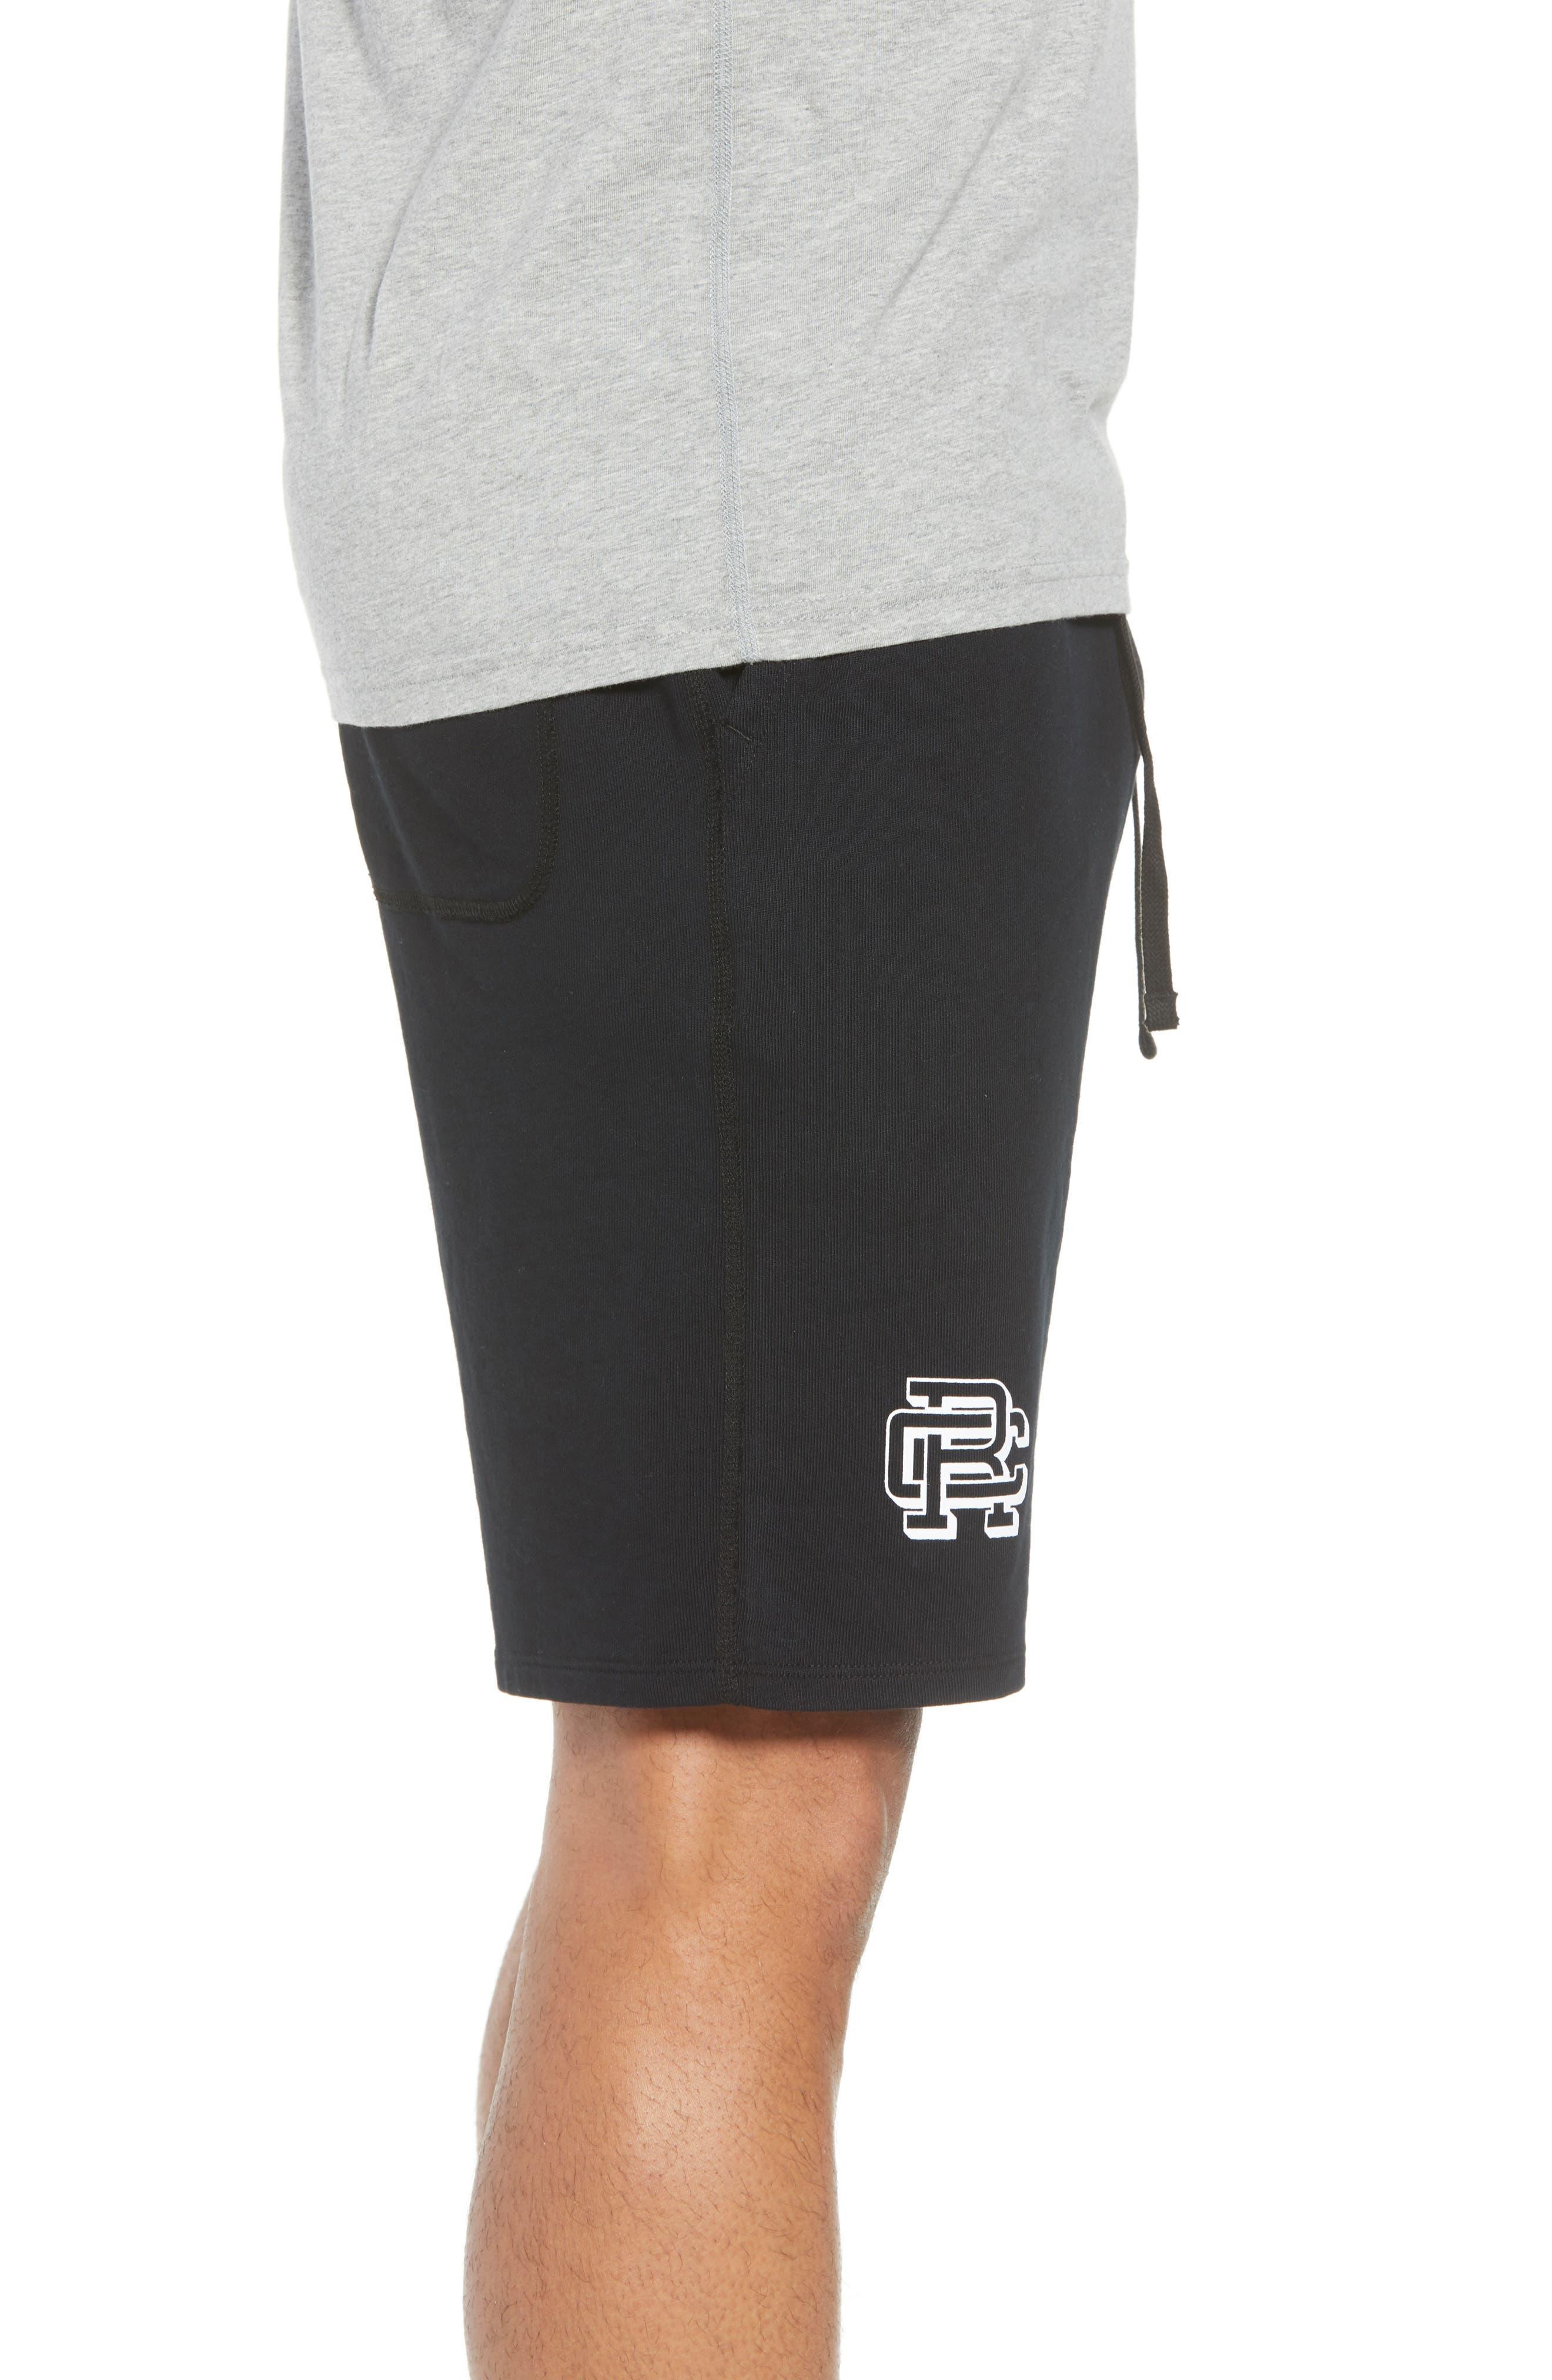 Shorts Lightweight Classic Fit Knit Shorts,                             Alternate thumbnail 3, color,                             BLACK